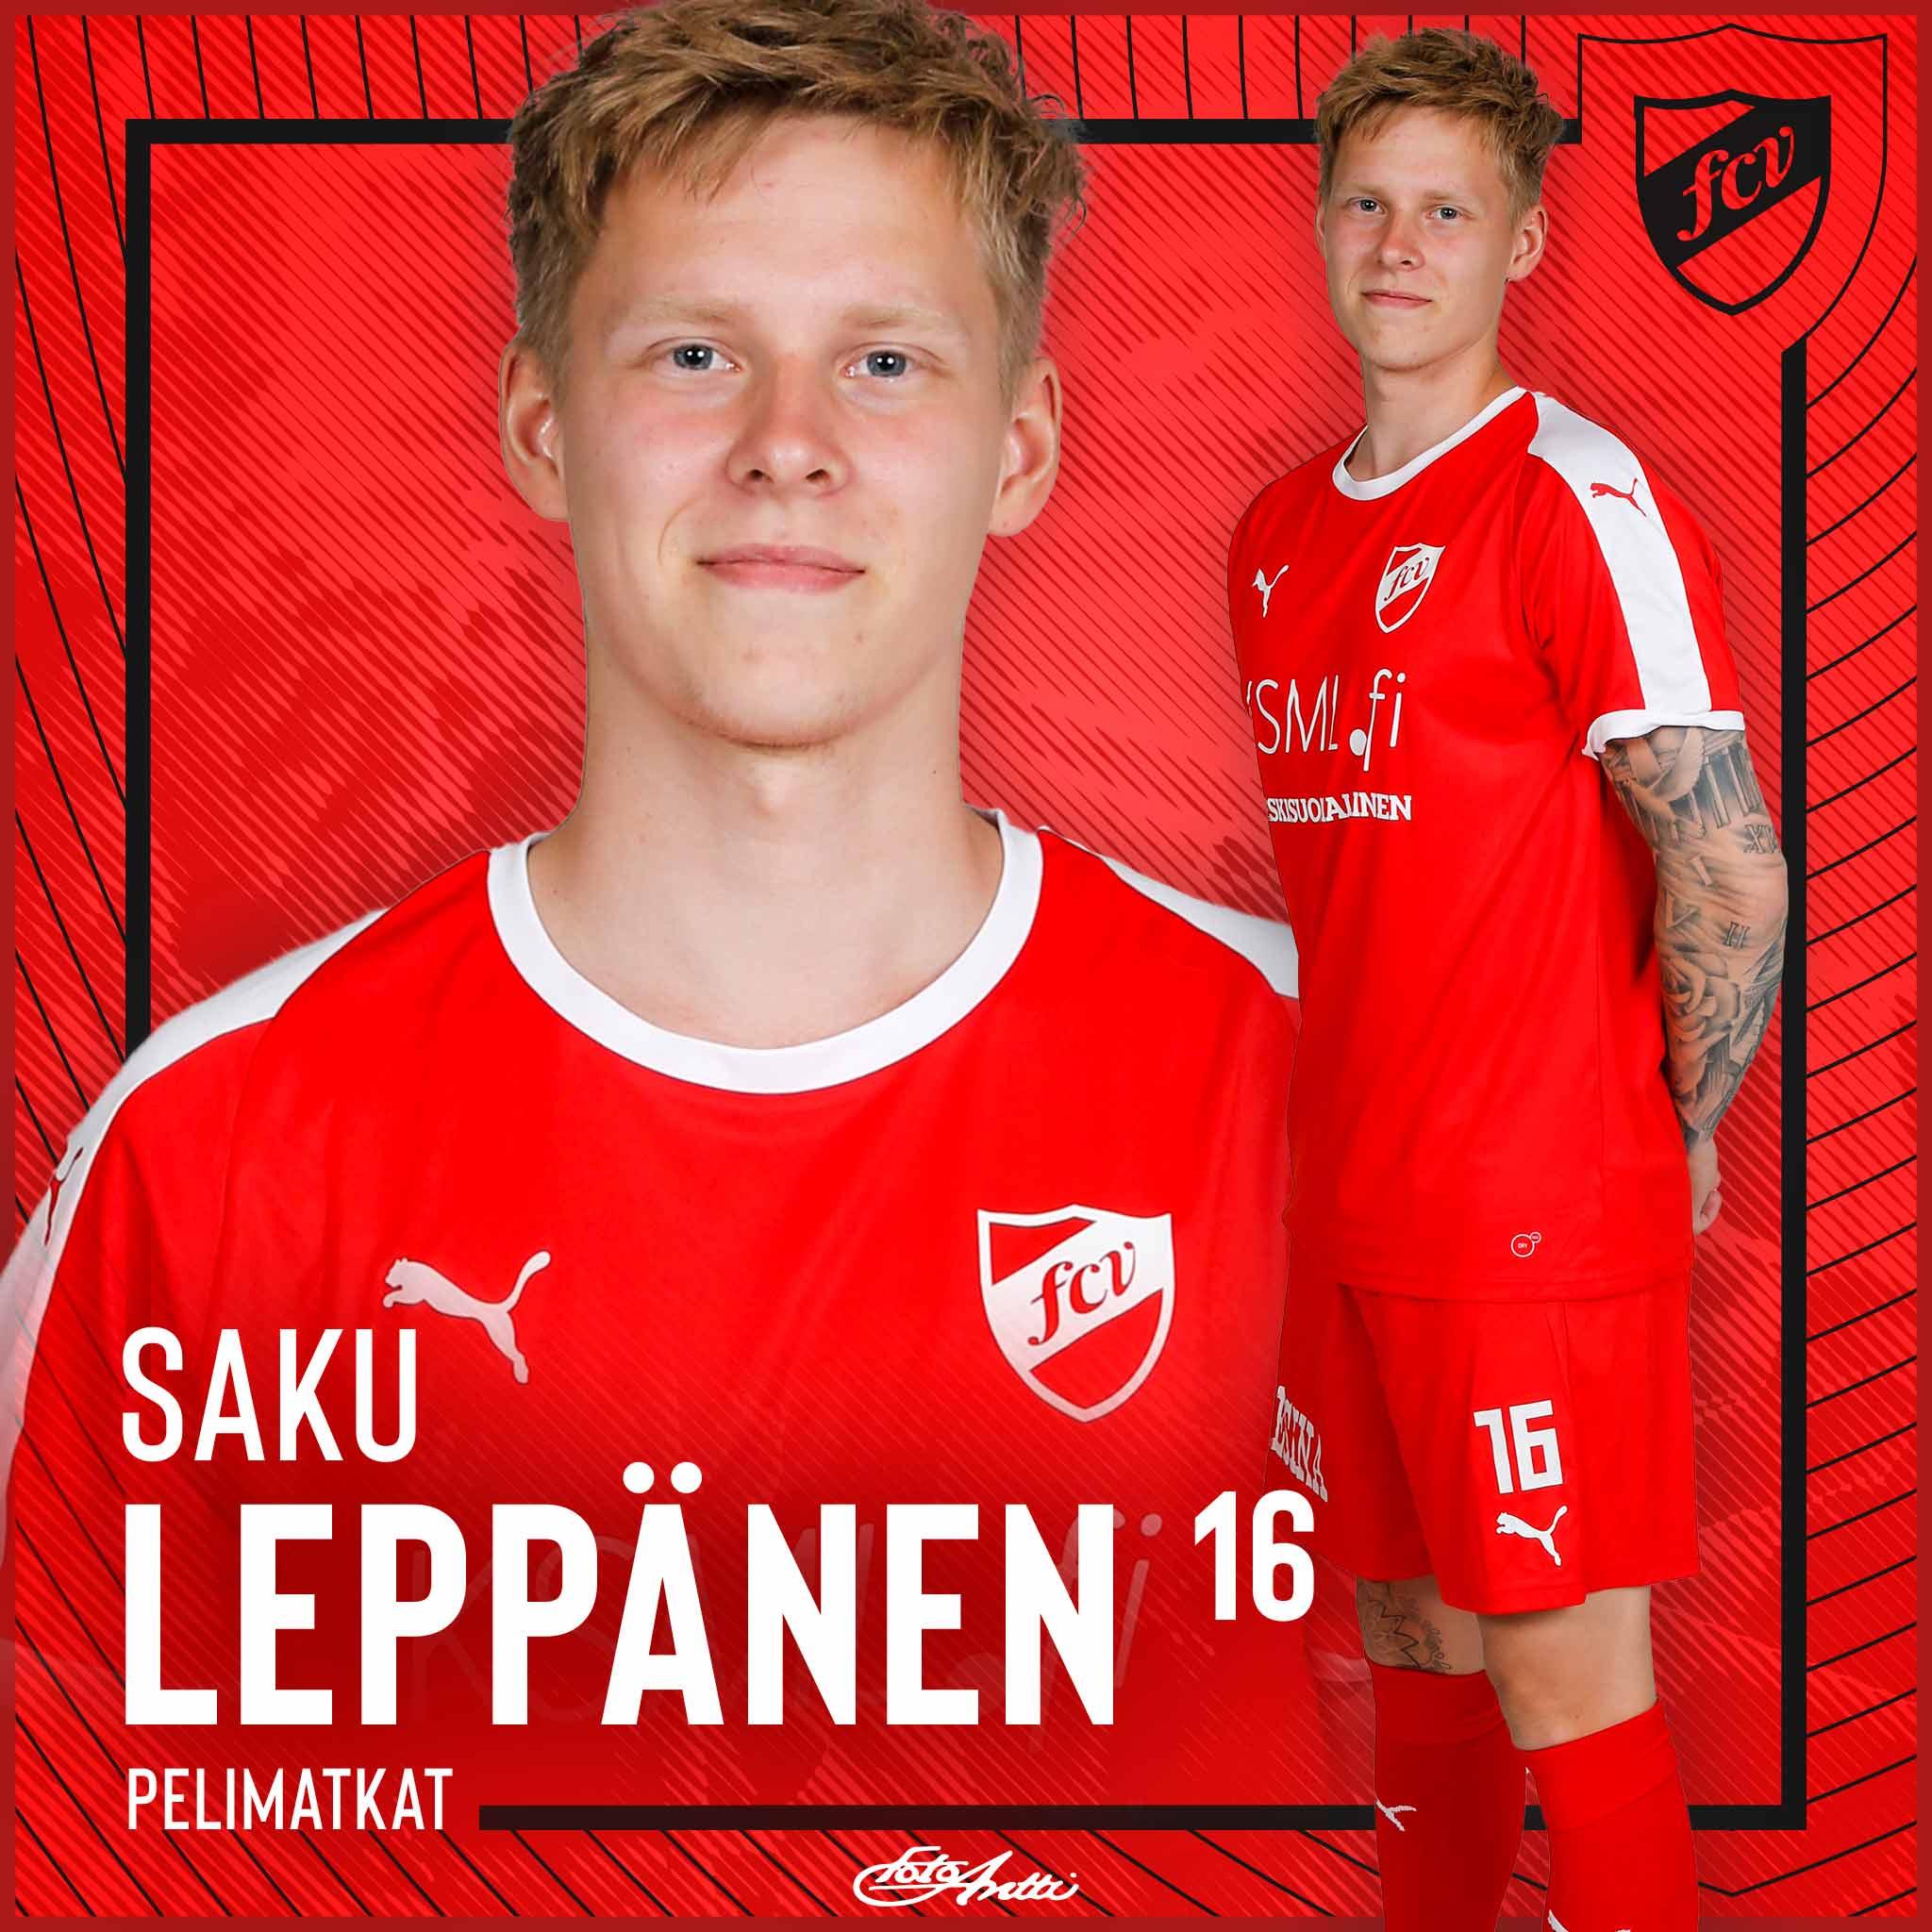 Saku Leppänen